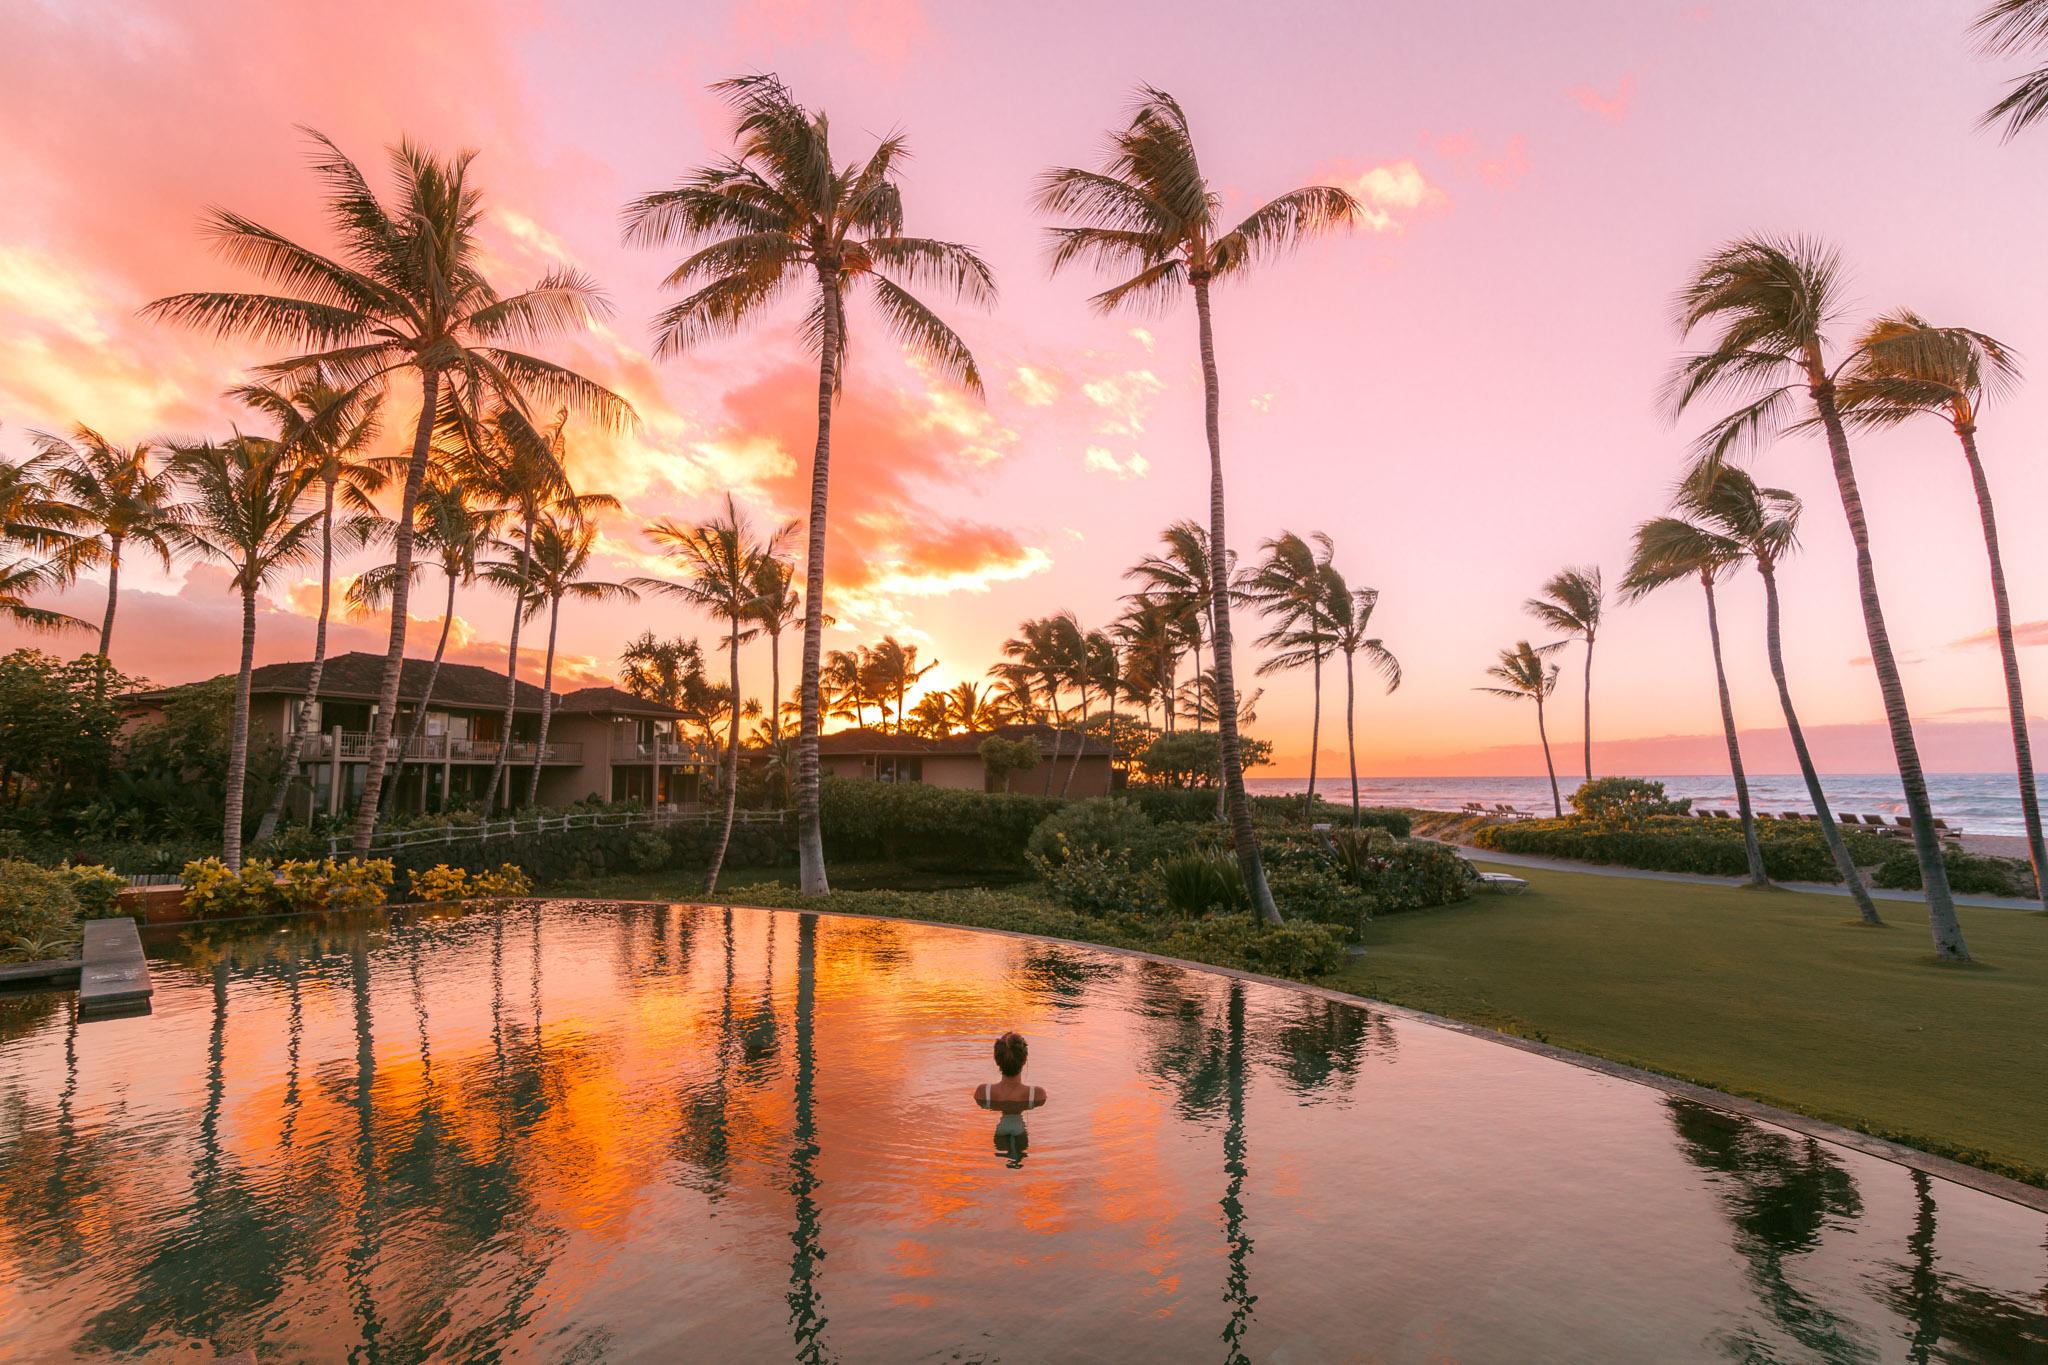 Palm Grove Pool at sunset // A Luxury Stay on the Big Island: Four Seasons Resort Hualalai // #readysetjetset #hawaii #bigisland #luxuryhotels #beachresorts #usa #travel